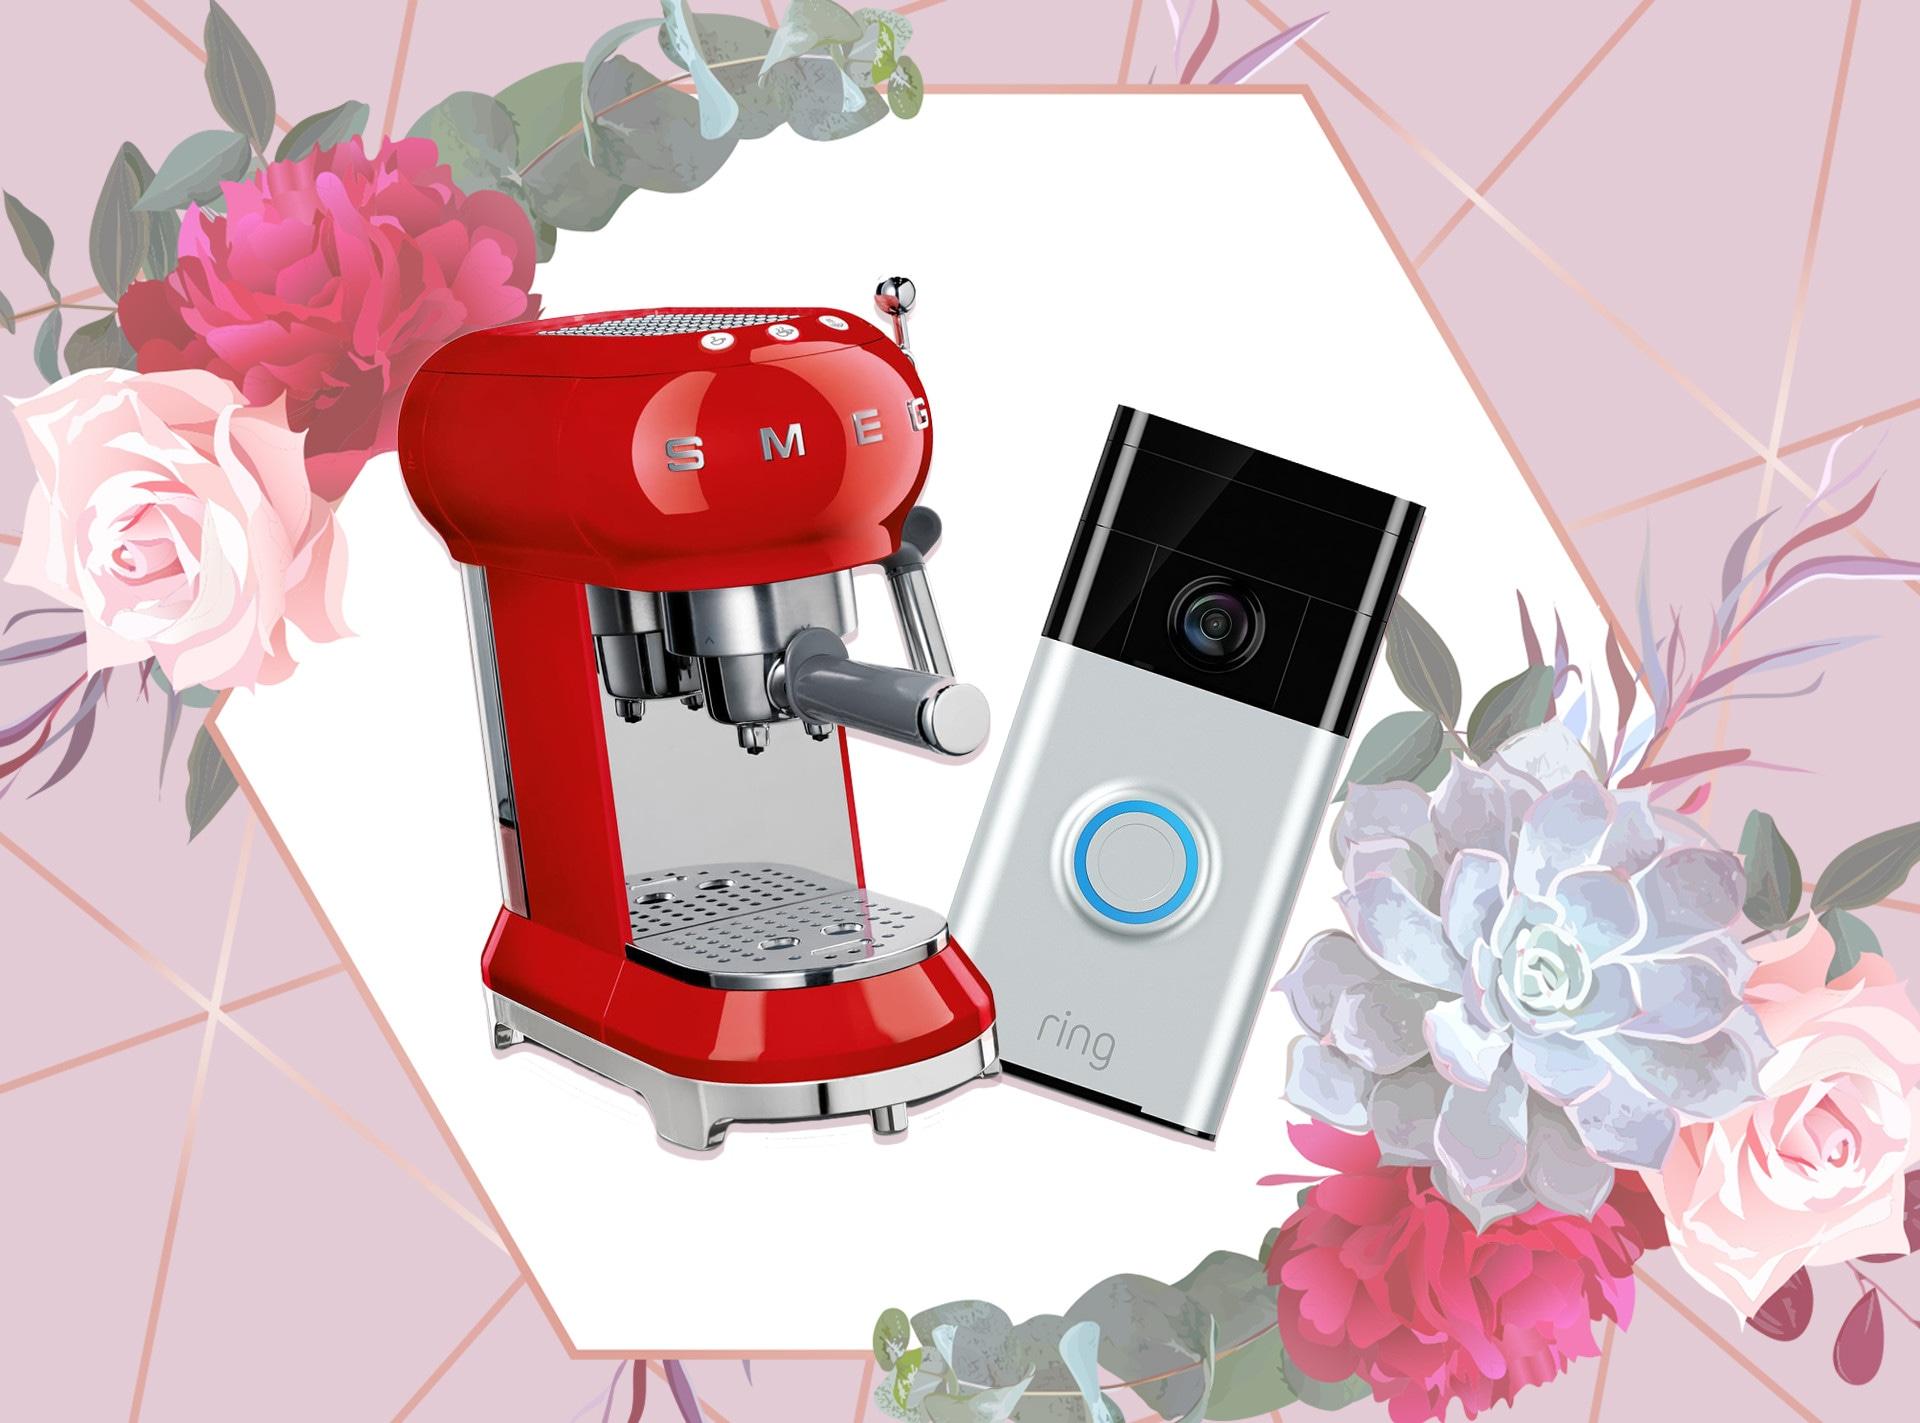 E-Comm: Wedding Gifts